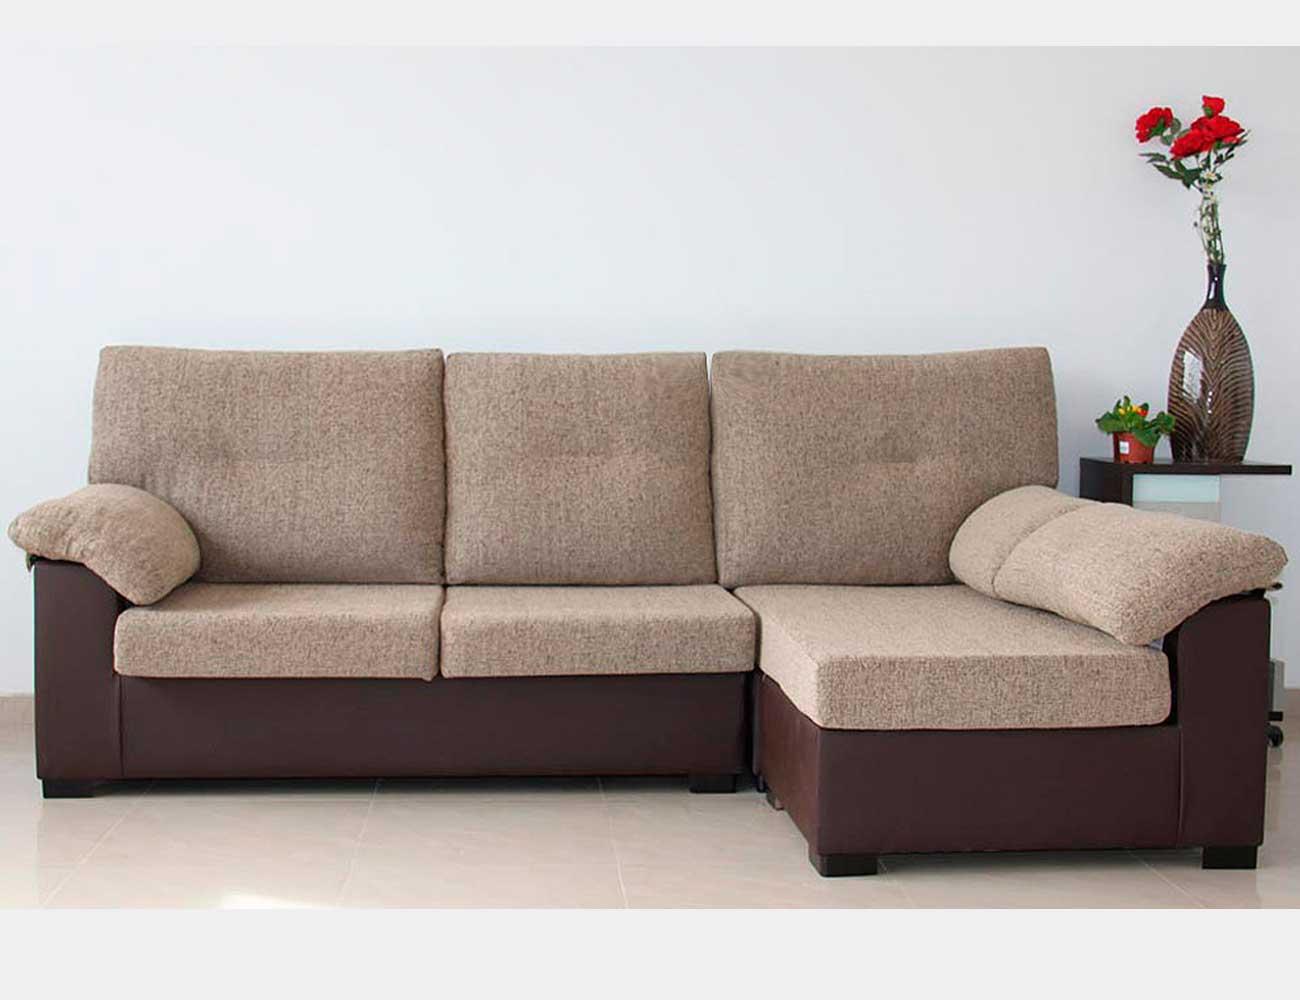 Sofa chaise longue barato5